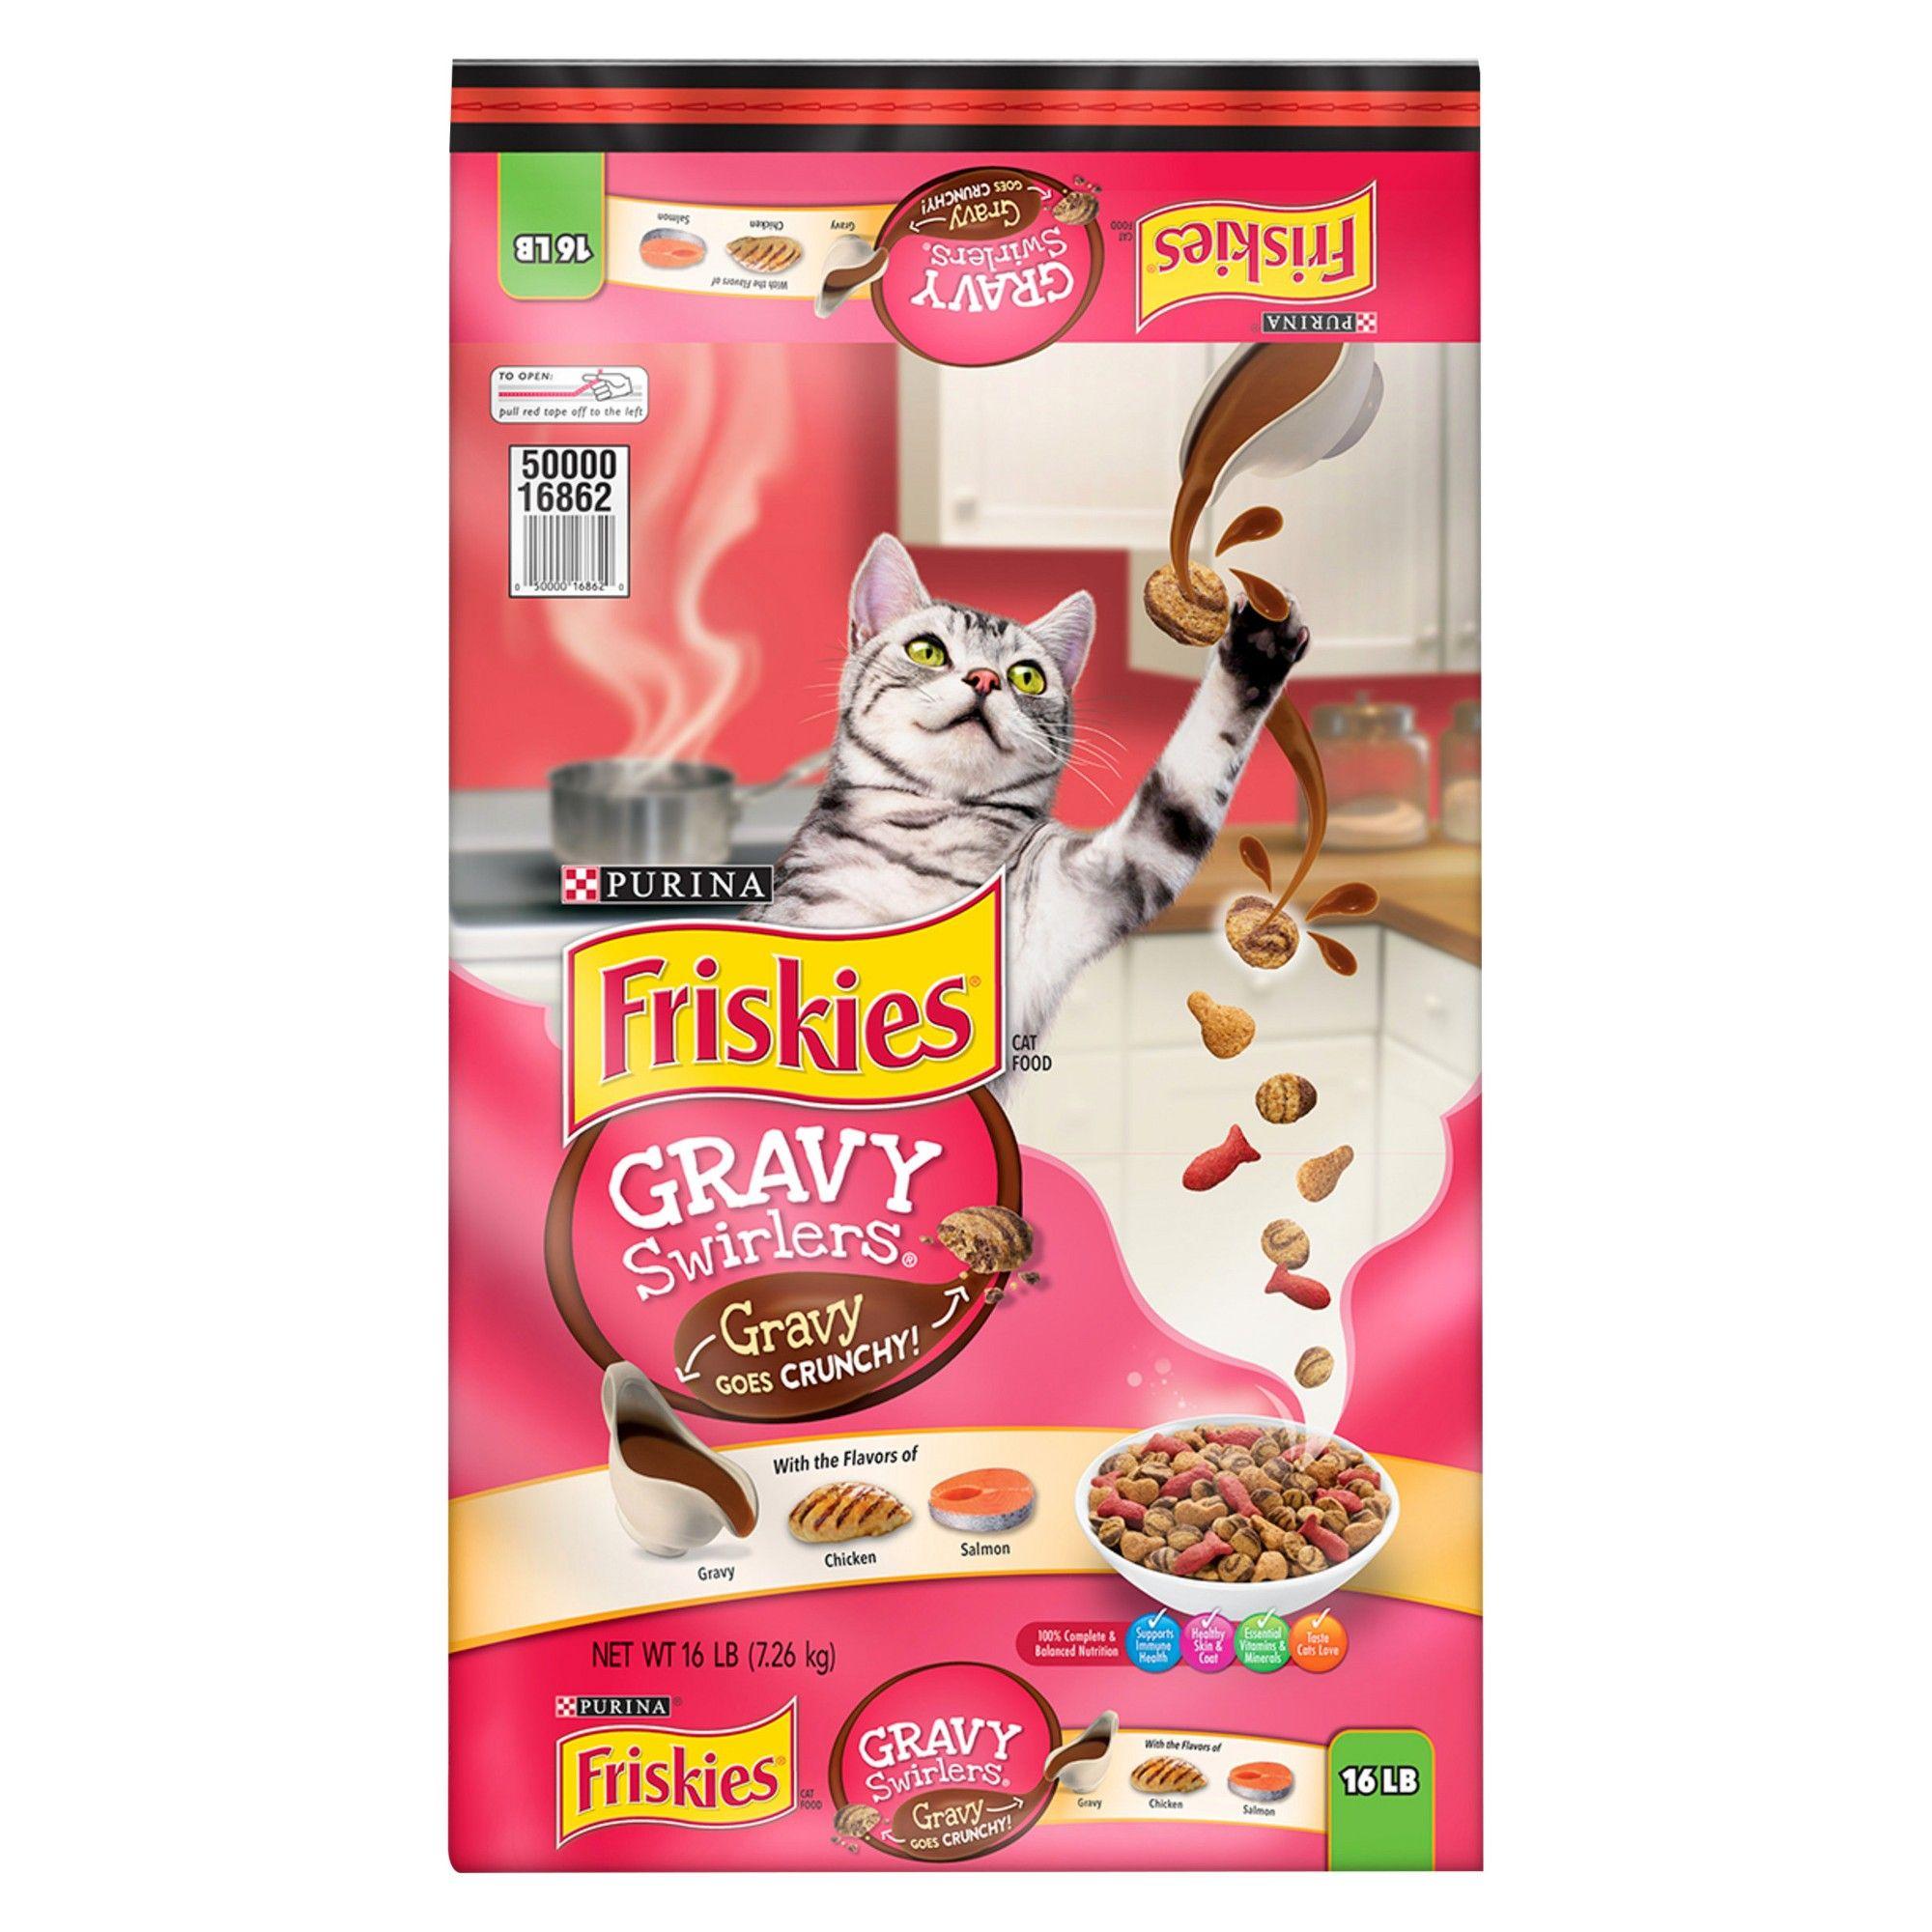 Friskies gravy swirlers dry cat food 16lbs